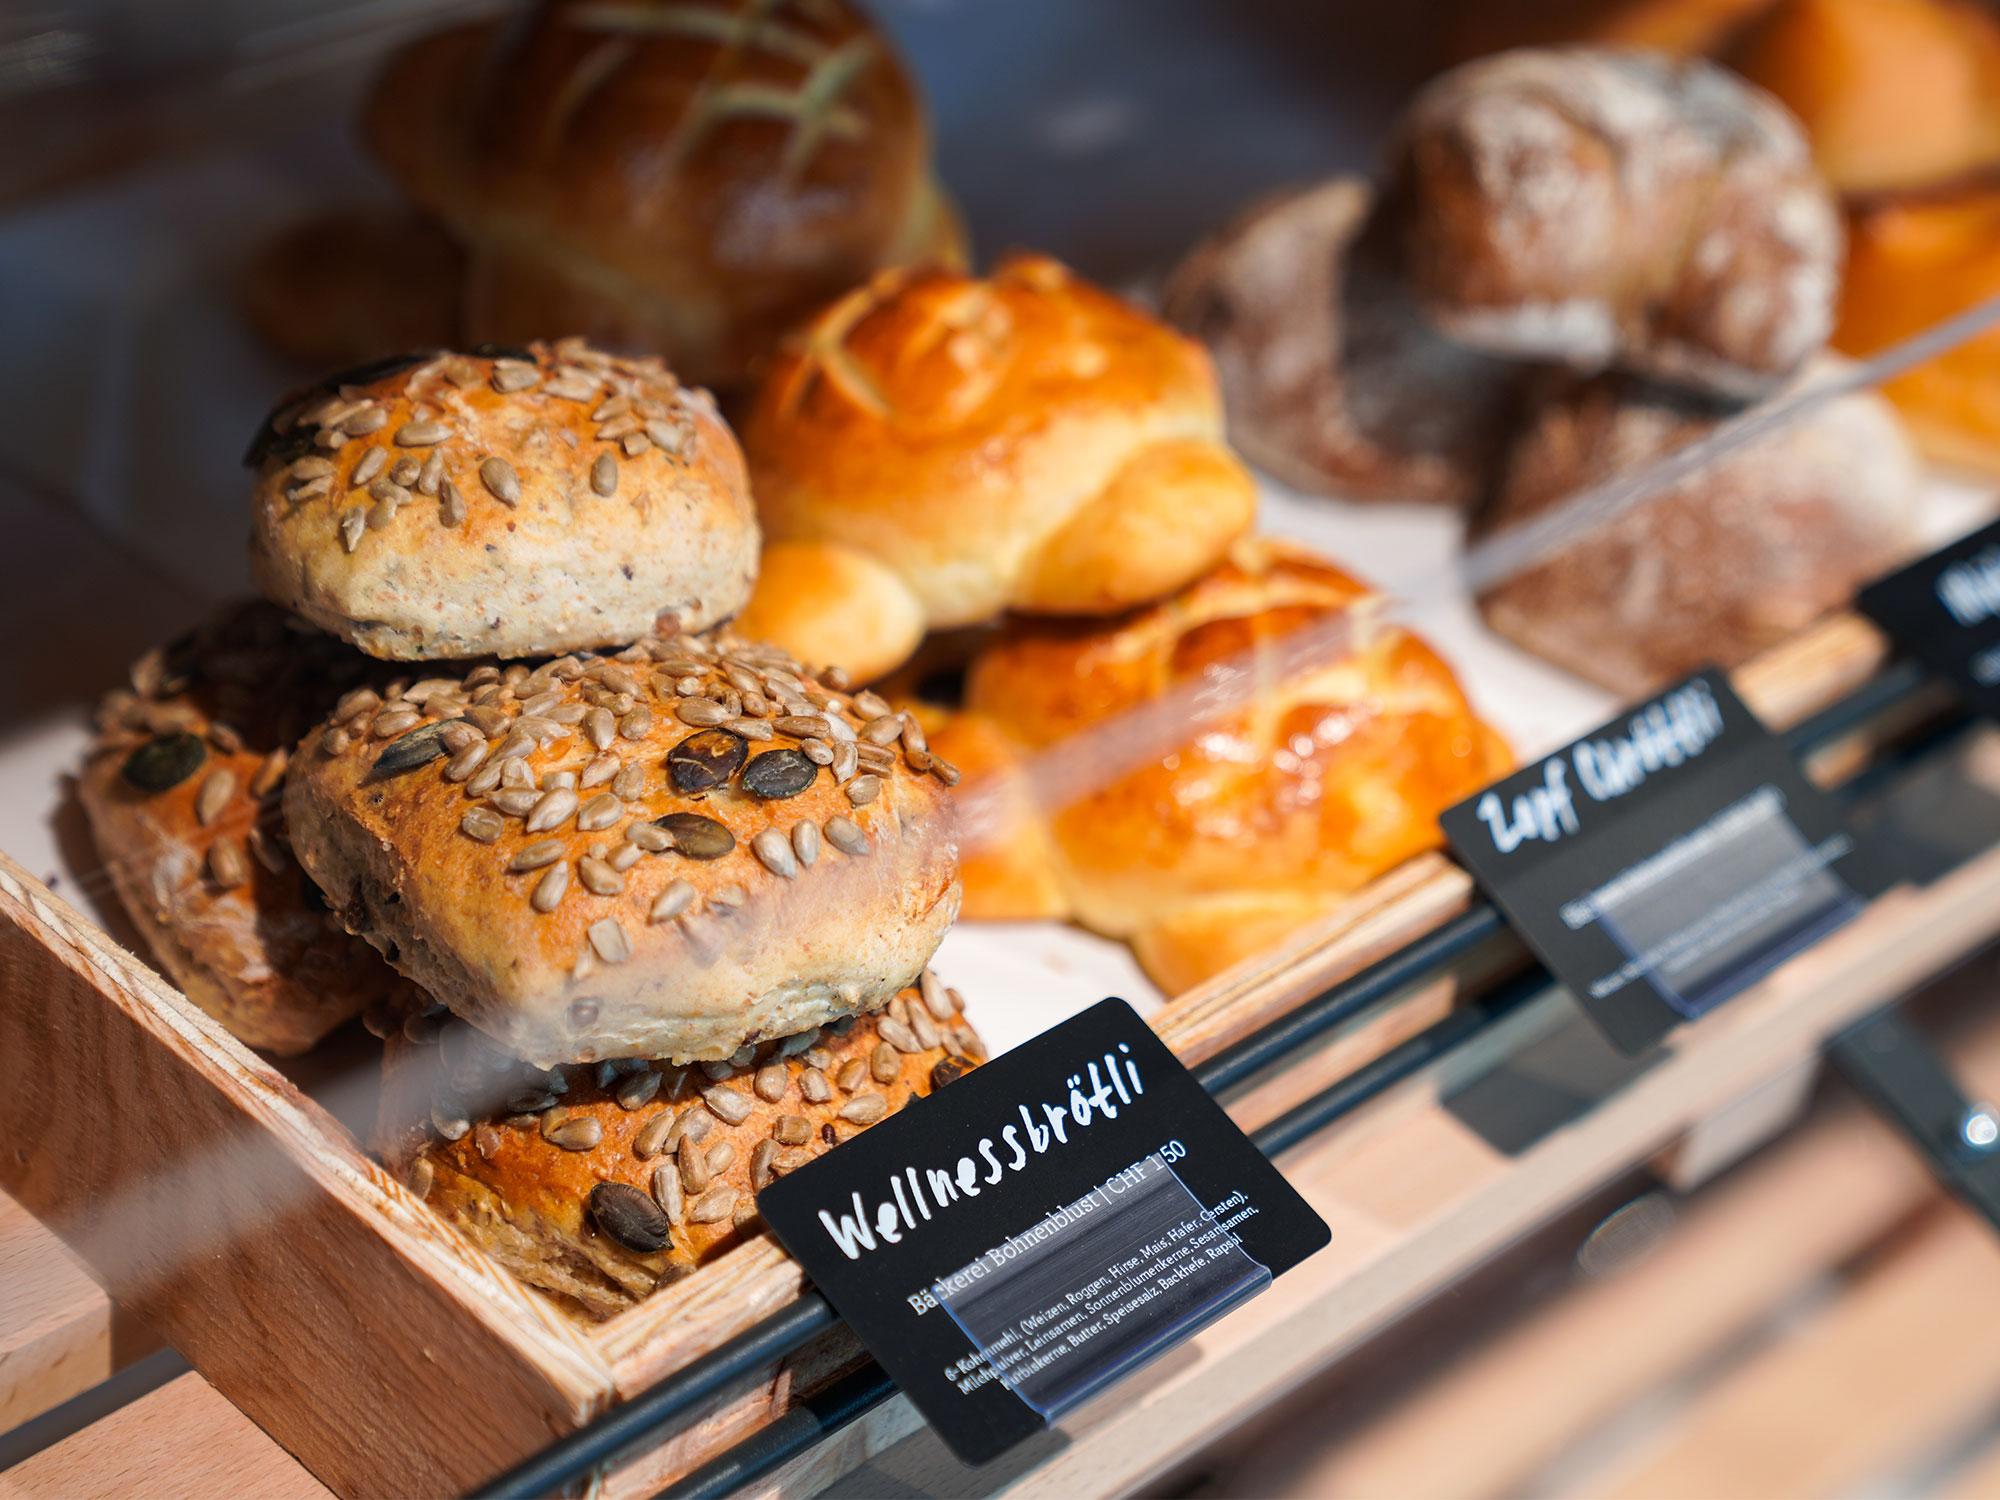 Brot- und Gebäckauswahl